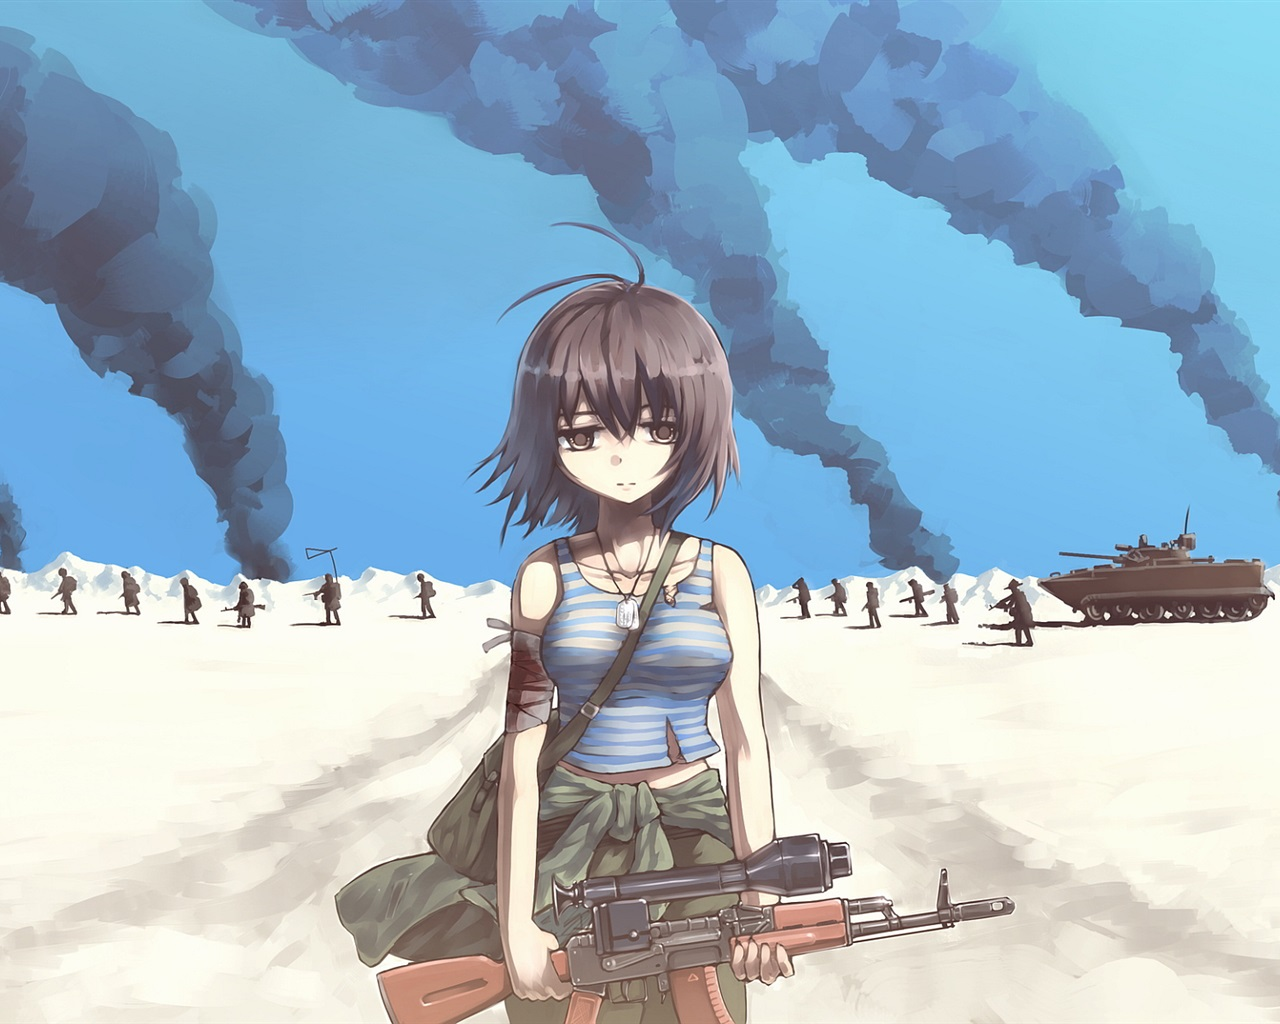 Fondos De Pantalla Chica Triste, Ejército, Guerra, Animado